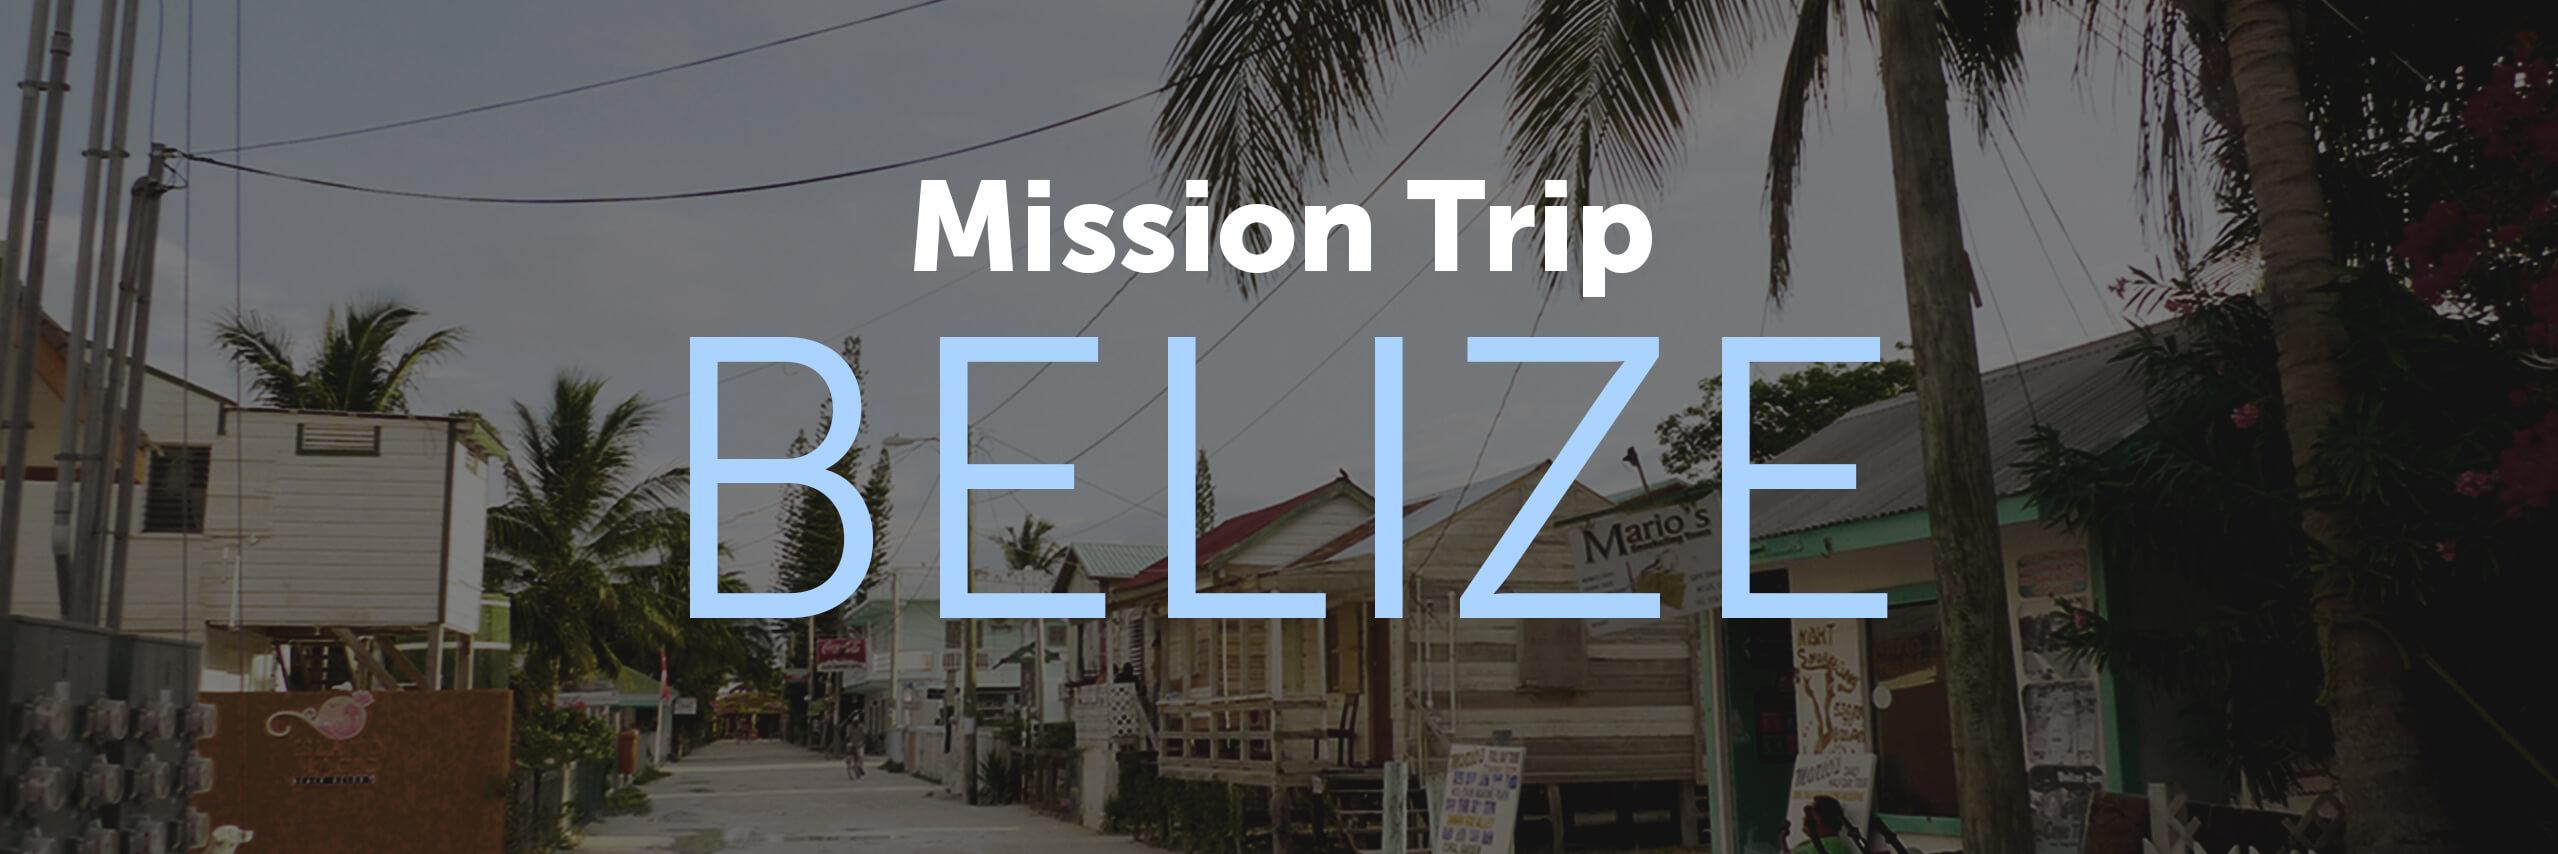 Belize Mission Trip